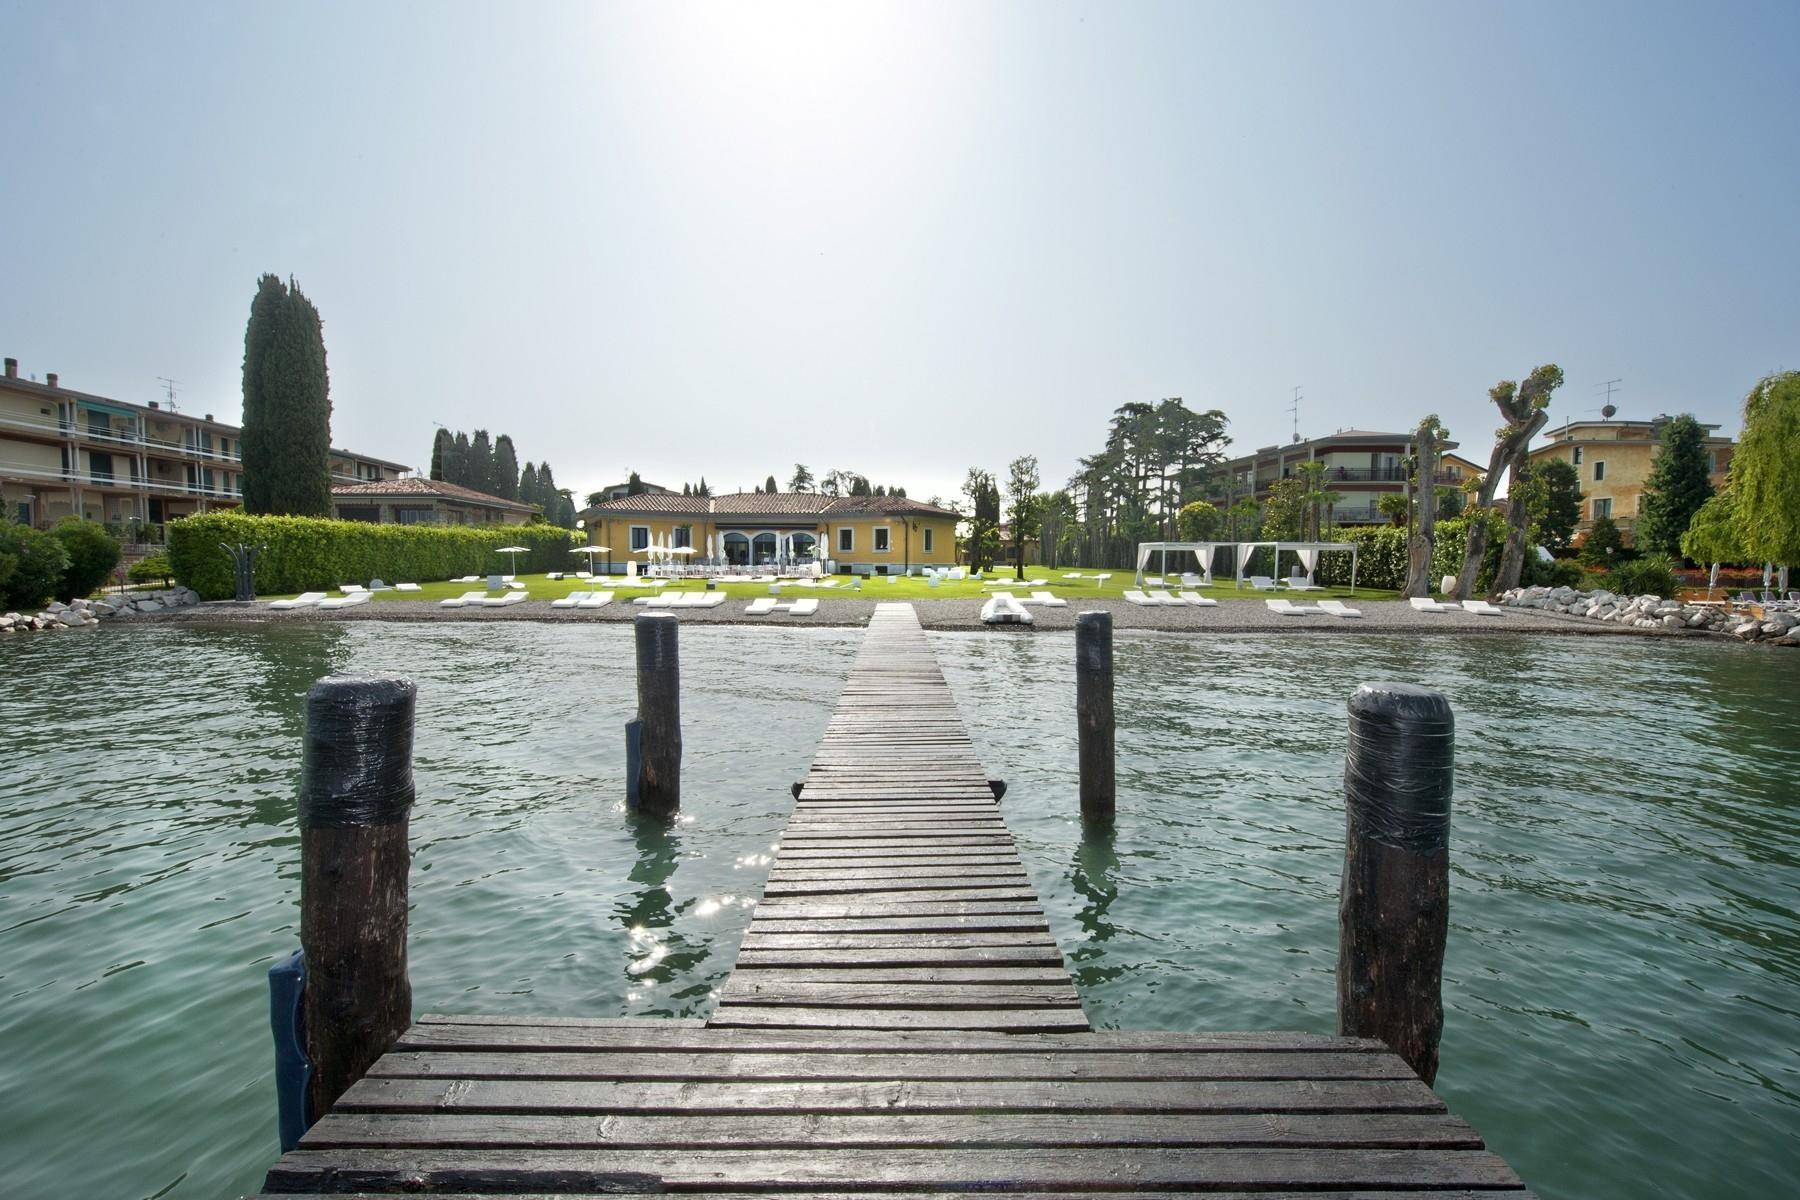 Villa unica pied dans l'eau con spiaggia e pontile a Sirmione - 1